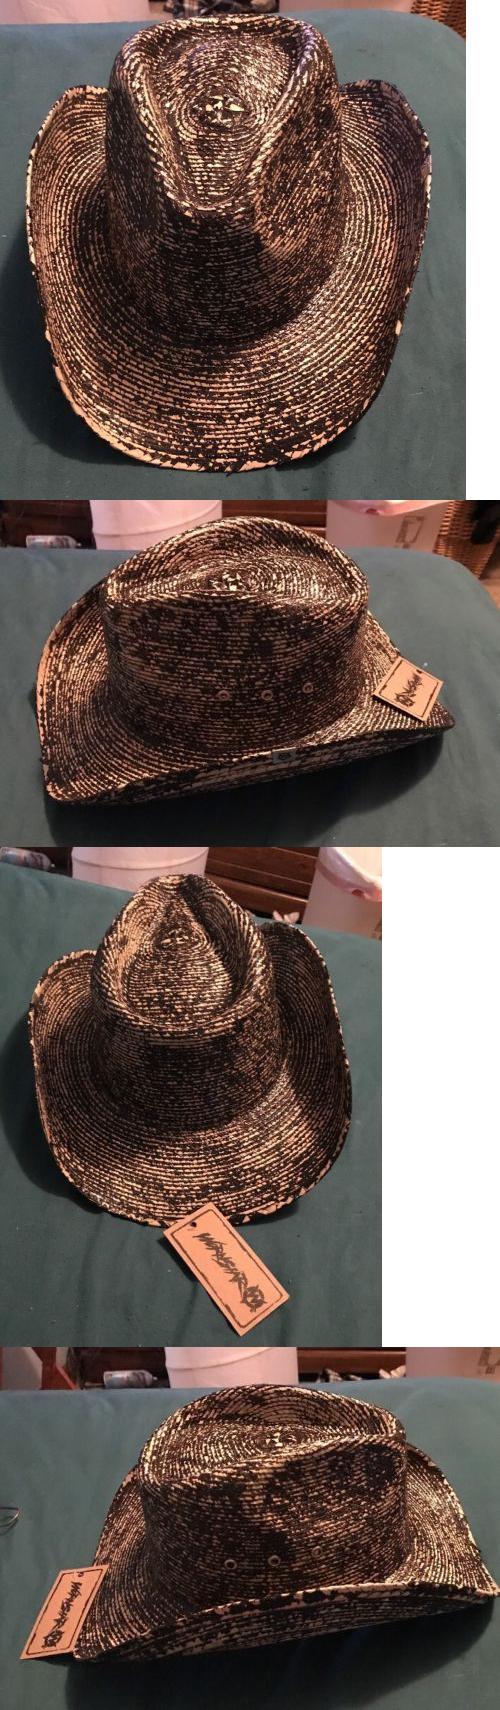 455923dea1a Hats 163543  Wornstar Hellrider Black And Natural Rocker Cowboy Hat! -  BUY  IT NOW ONLY   32 on eBay!